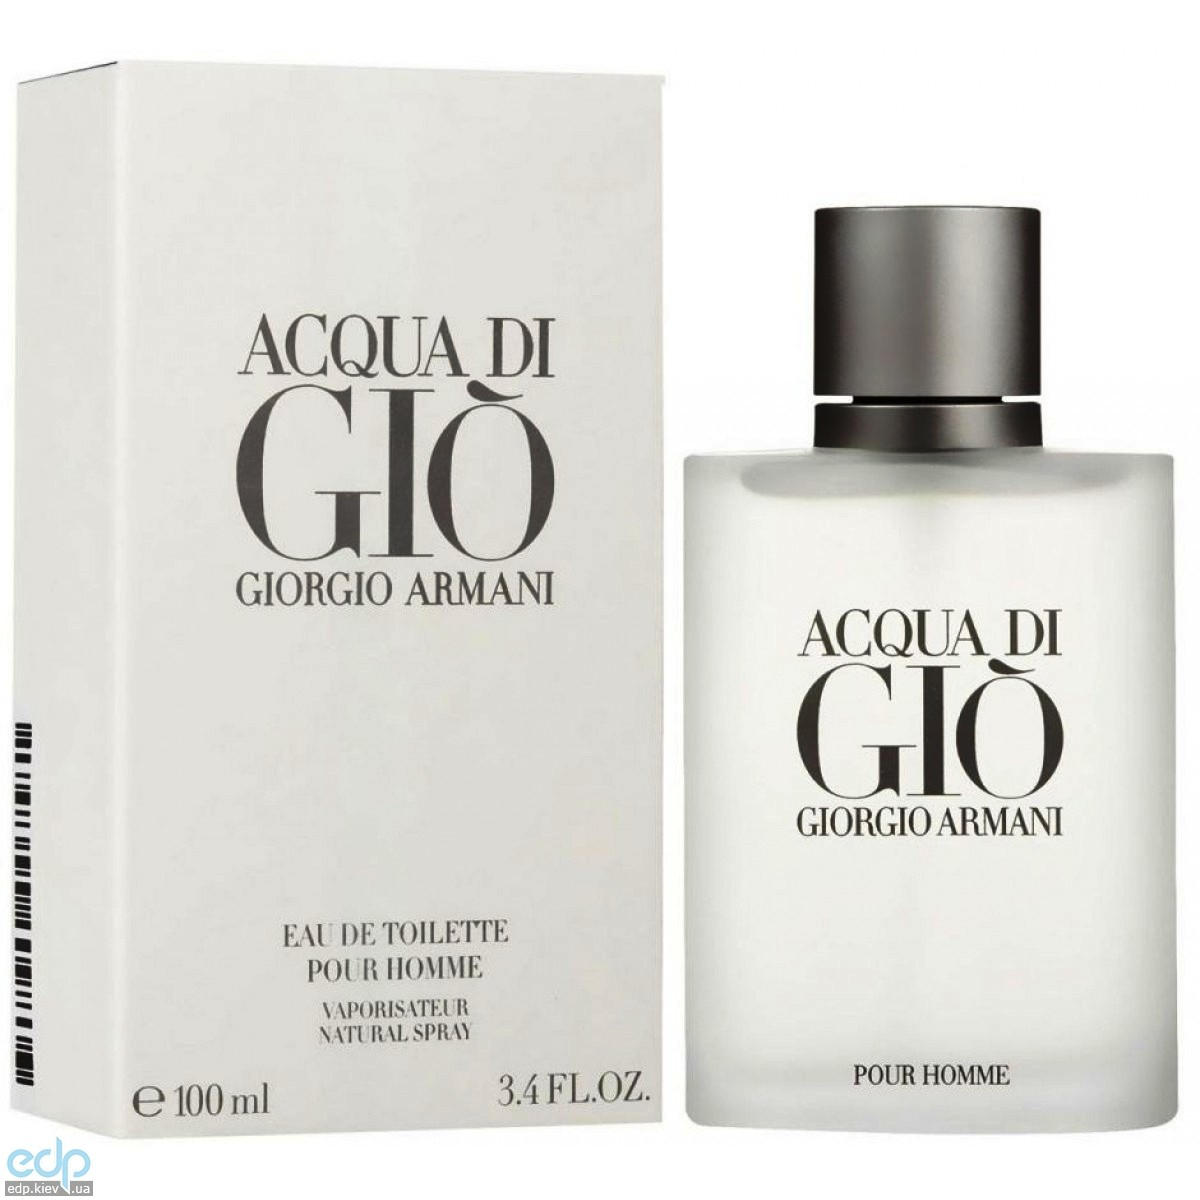 Giorgio Armani Acqua di Gio pour homme - туалетная вода - 200 ml limited